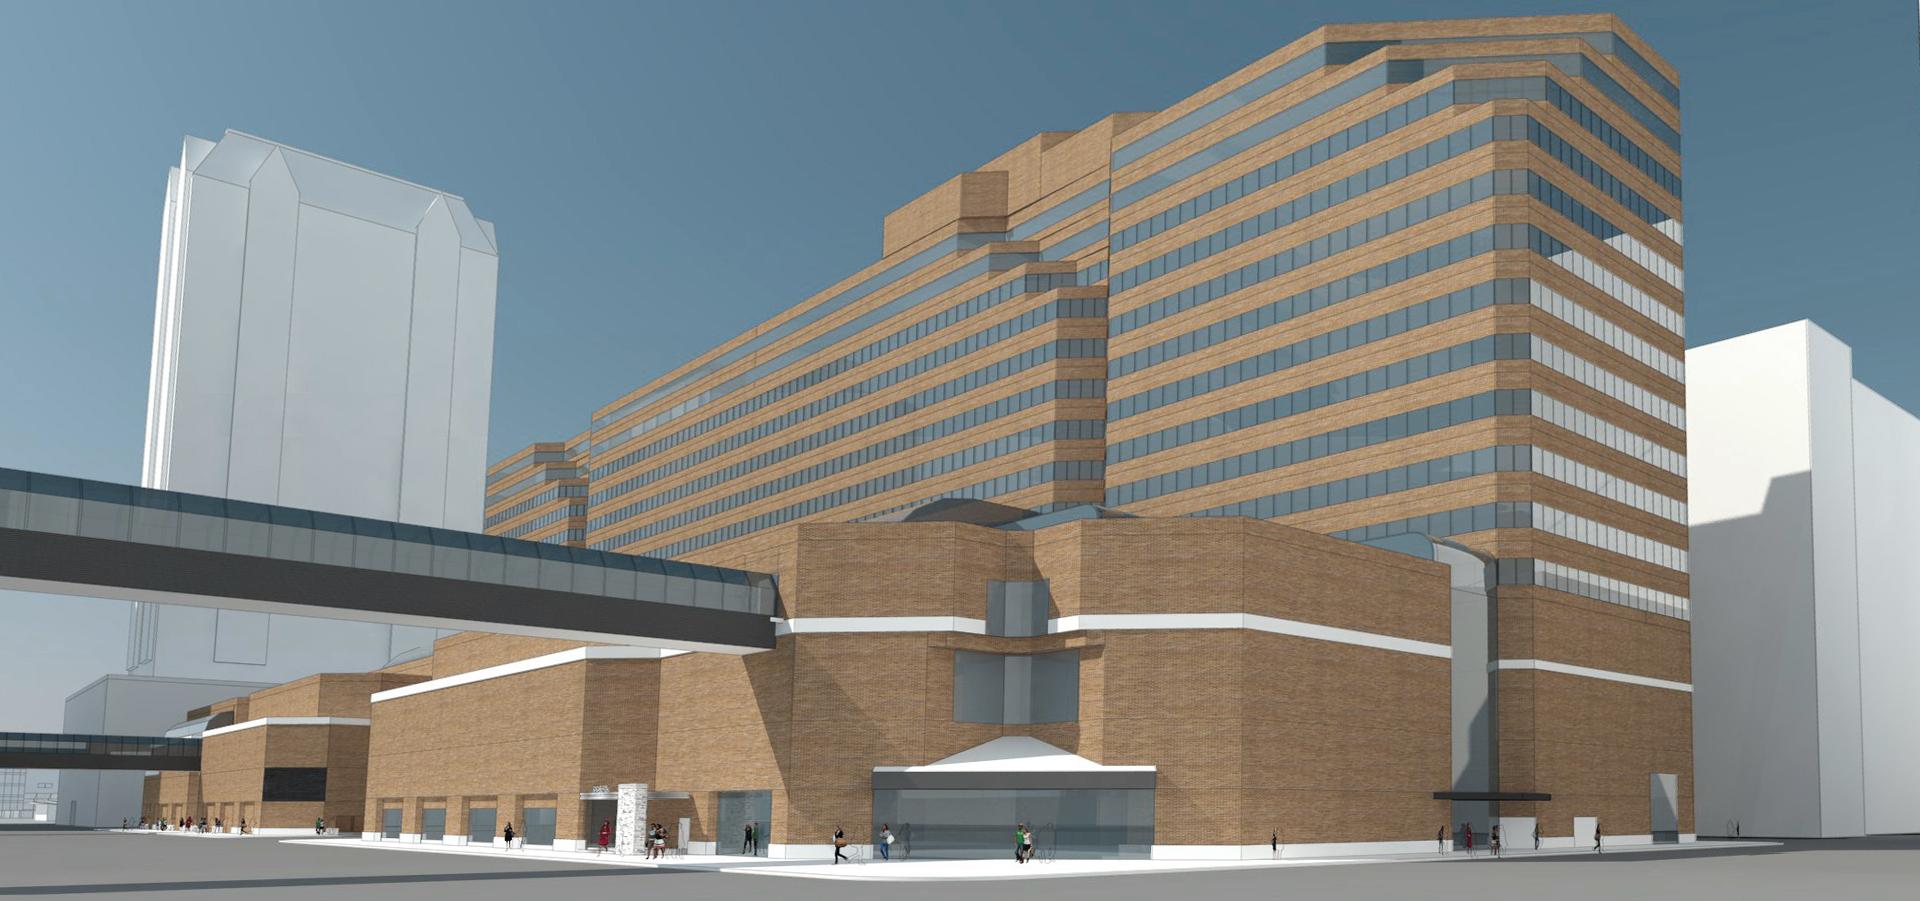 (2/7) Houston Center - Campus Renovation